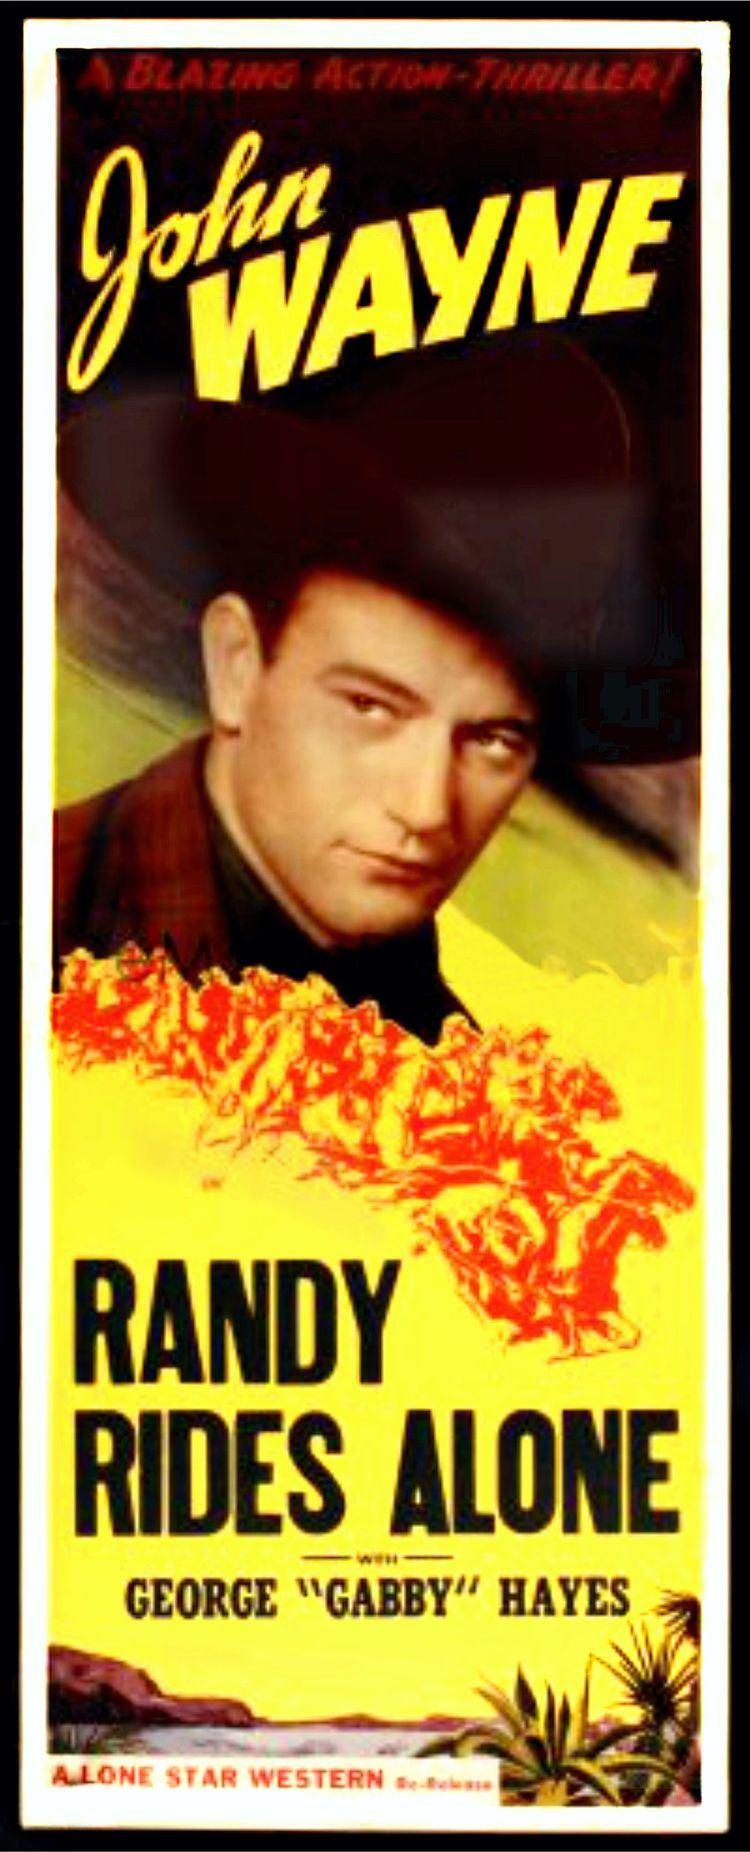 Randy Rides Alone John Wayne Iconic Images 1934 Part 1 My Favorite Westerns